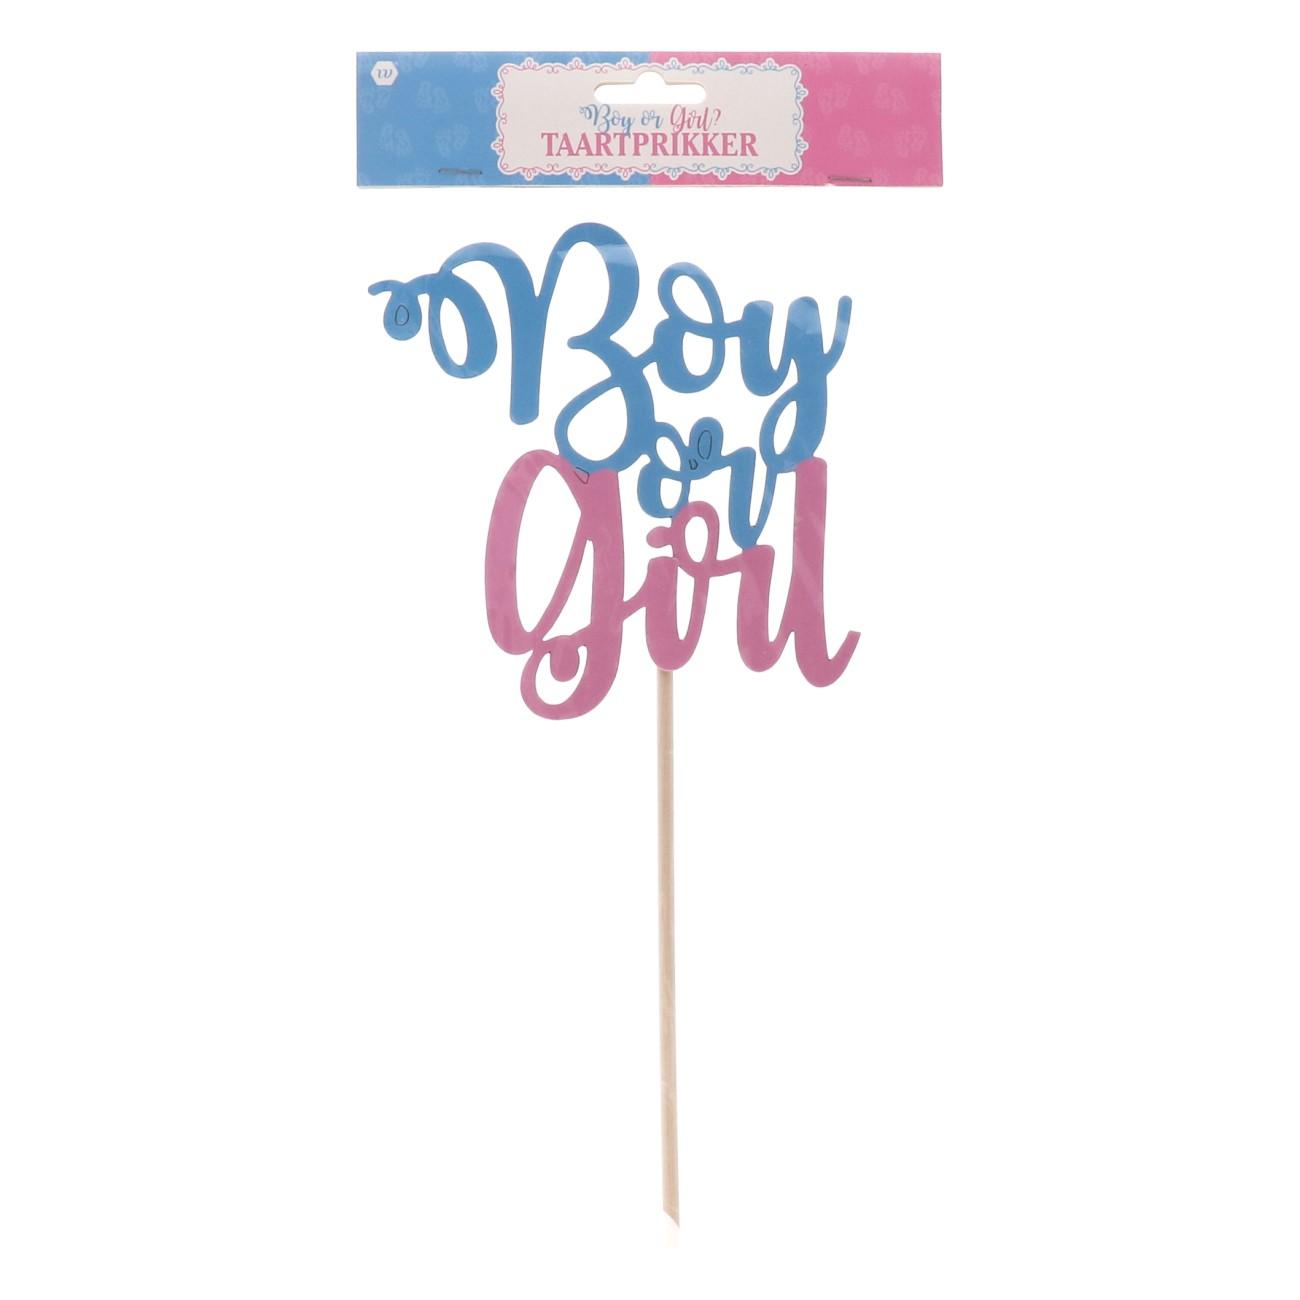 Taartprikker boy or girl?